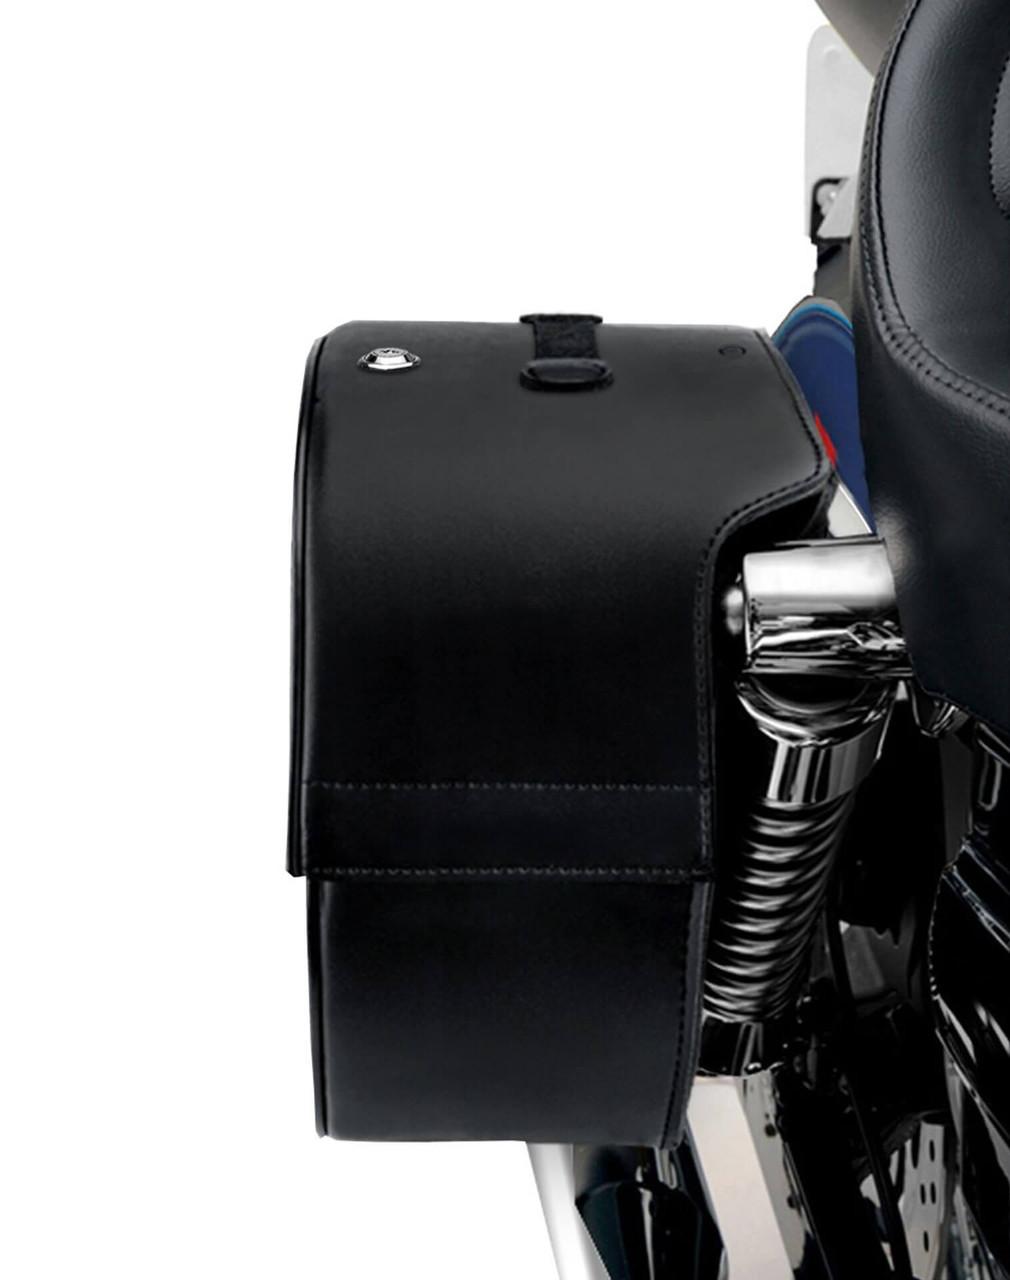 Honda Rebel 500 Spear Shock Cutout Motorcycle Saddlebags Shock Cutout View